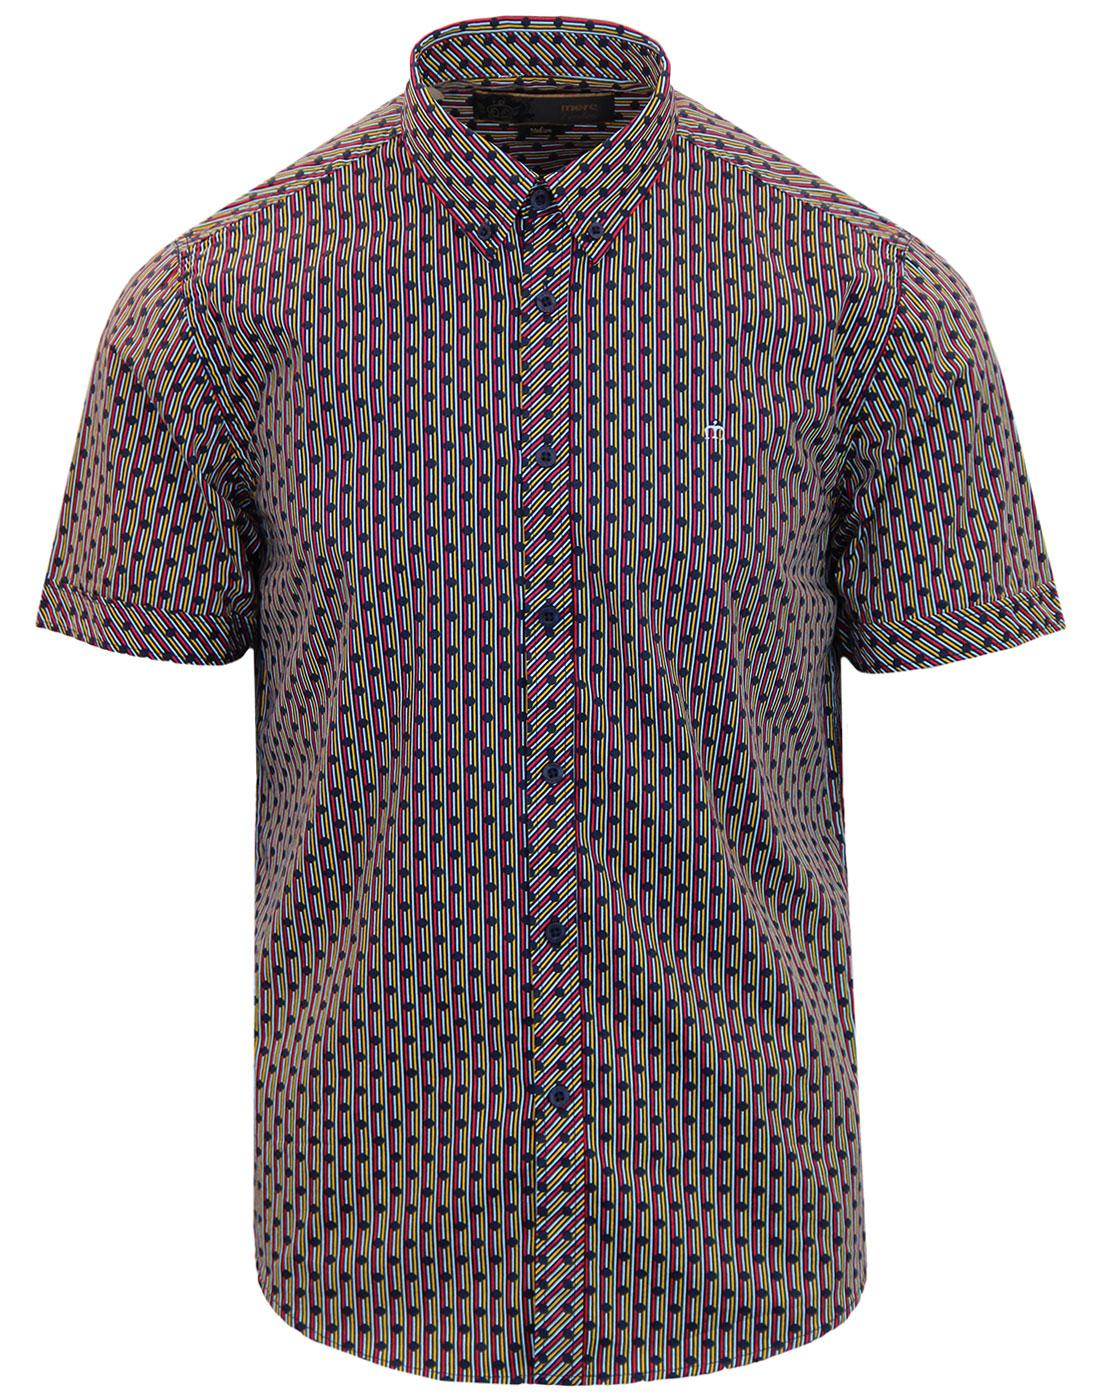 Barrack MERC 1960s Mod Polka Dot Stripe Shirt NAVY